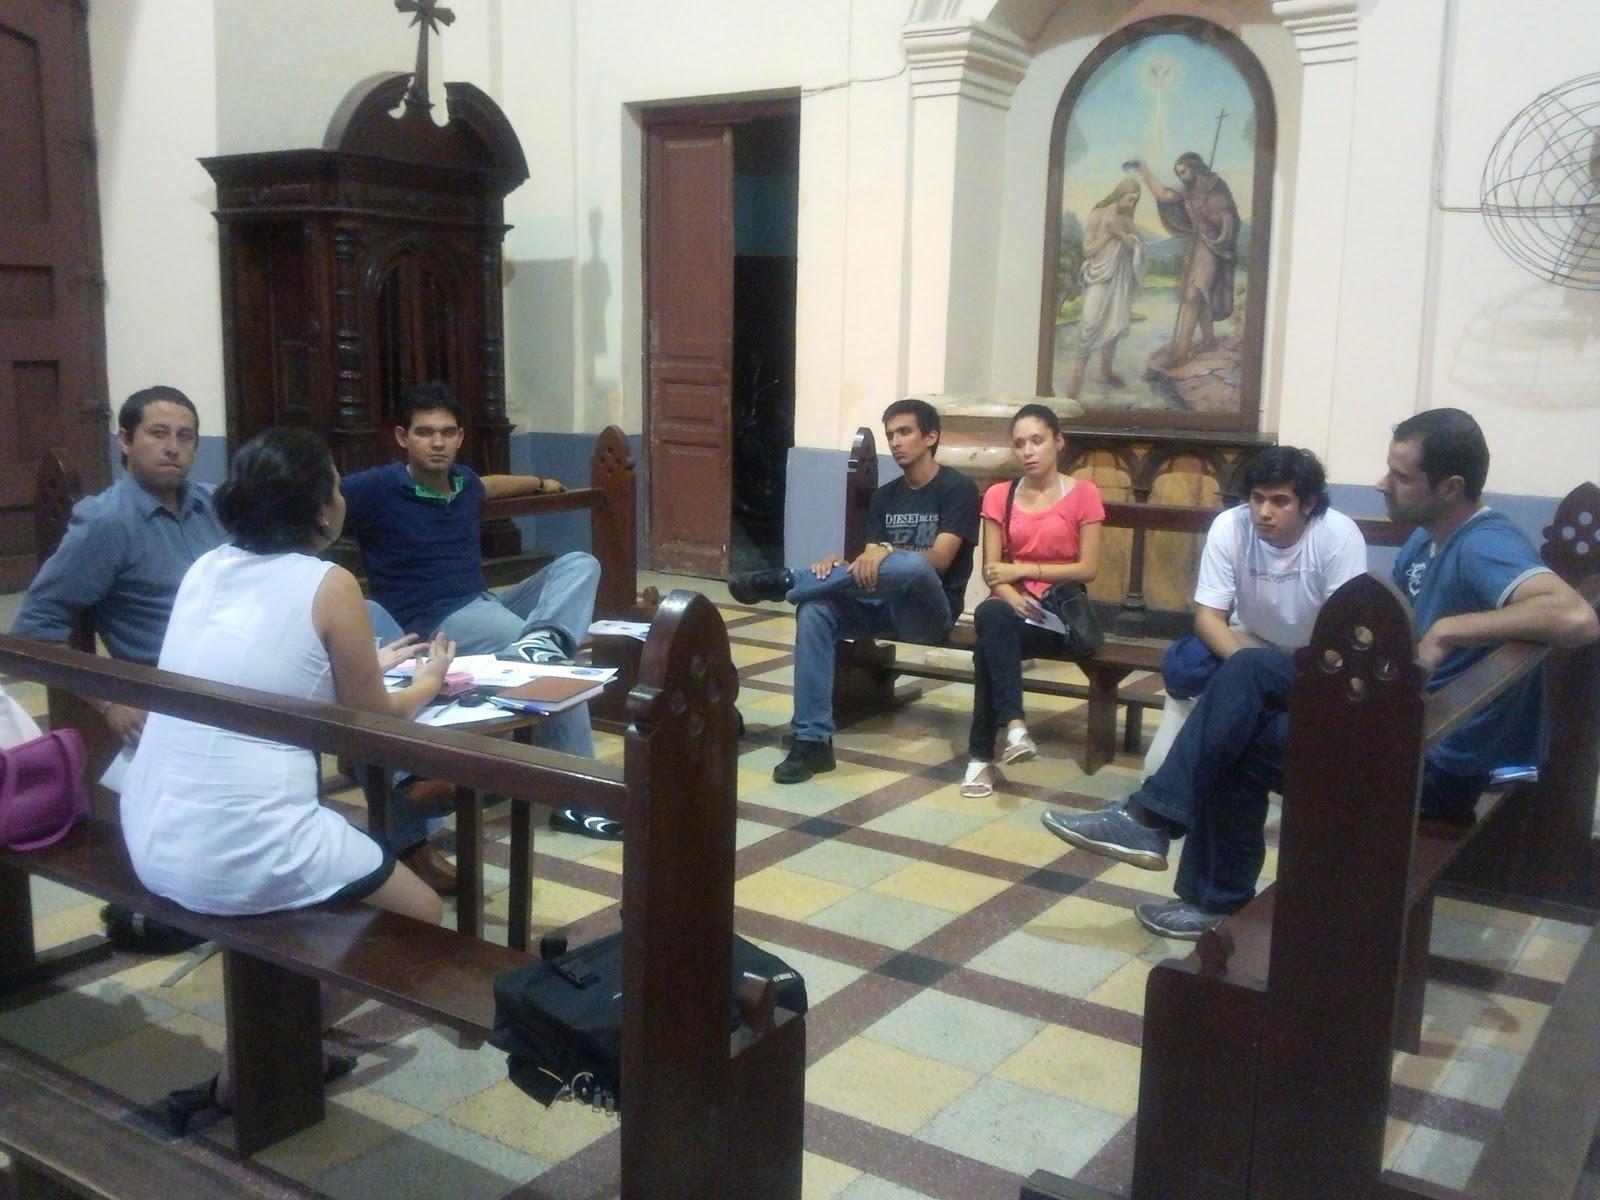 Pastoral Juvenil Arquidiocesa Asunción pastoraljuvenilasuncion@gmail